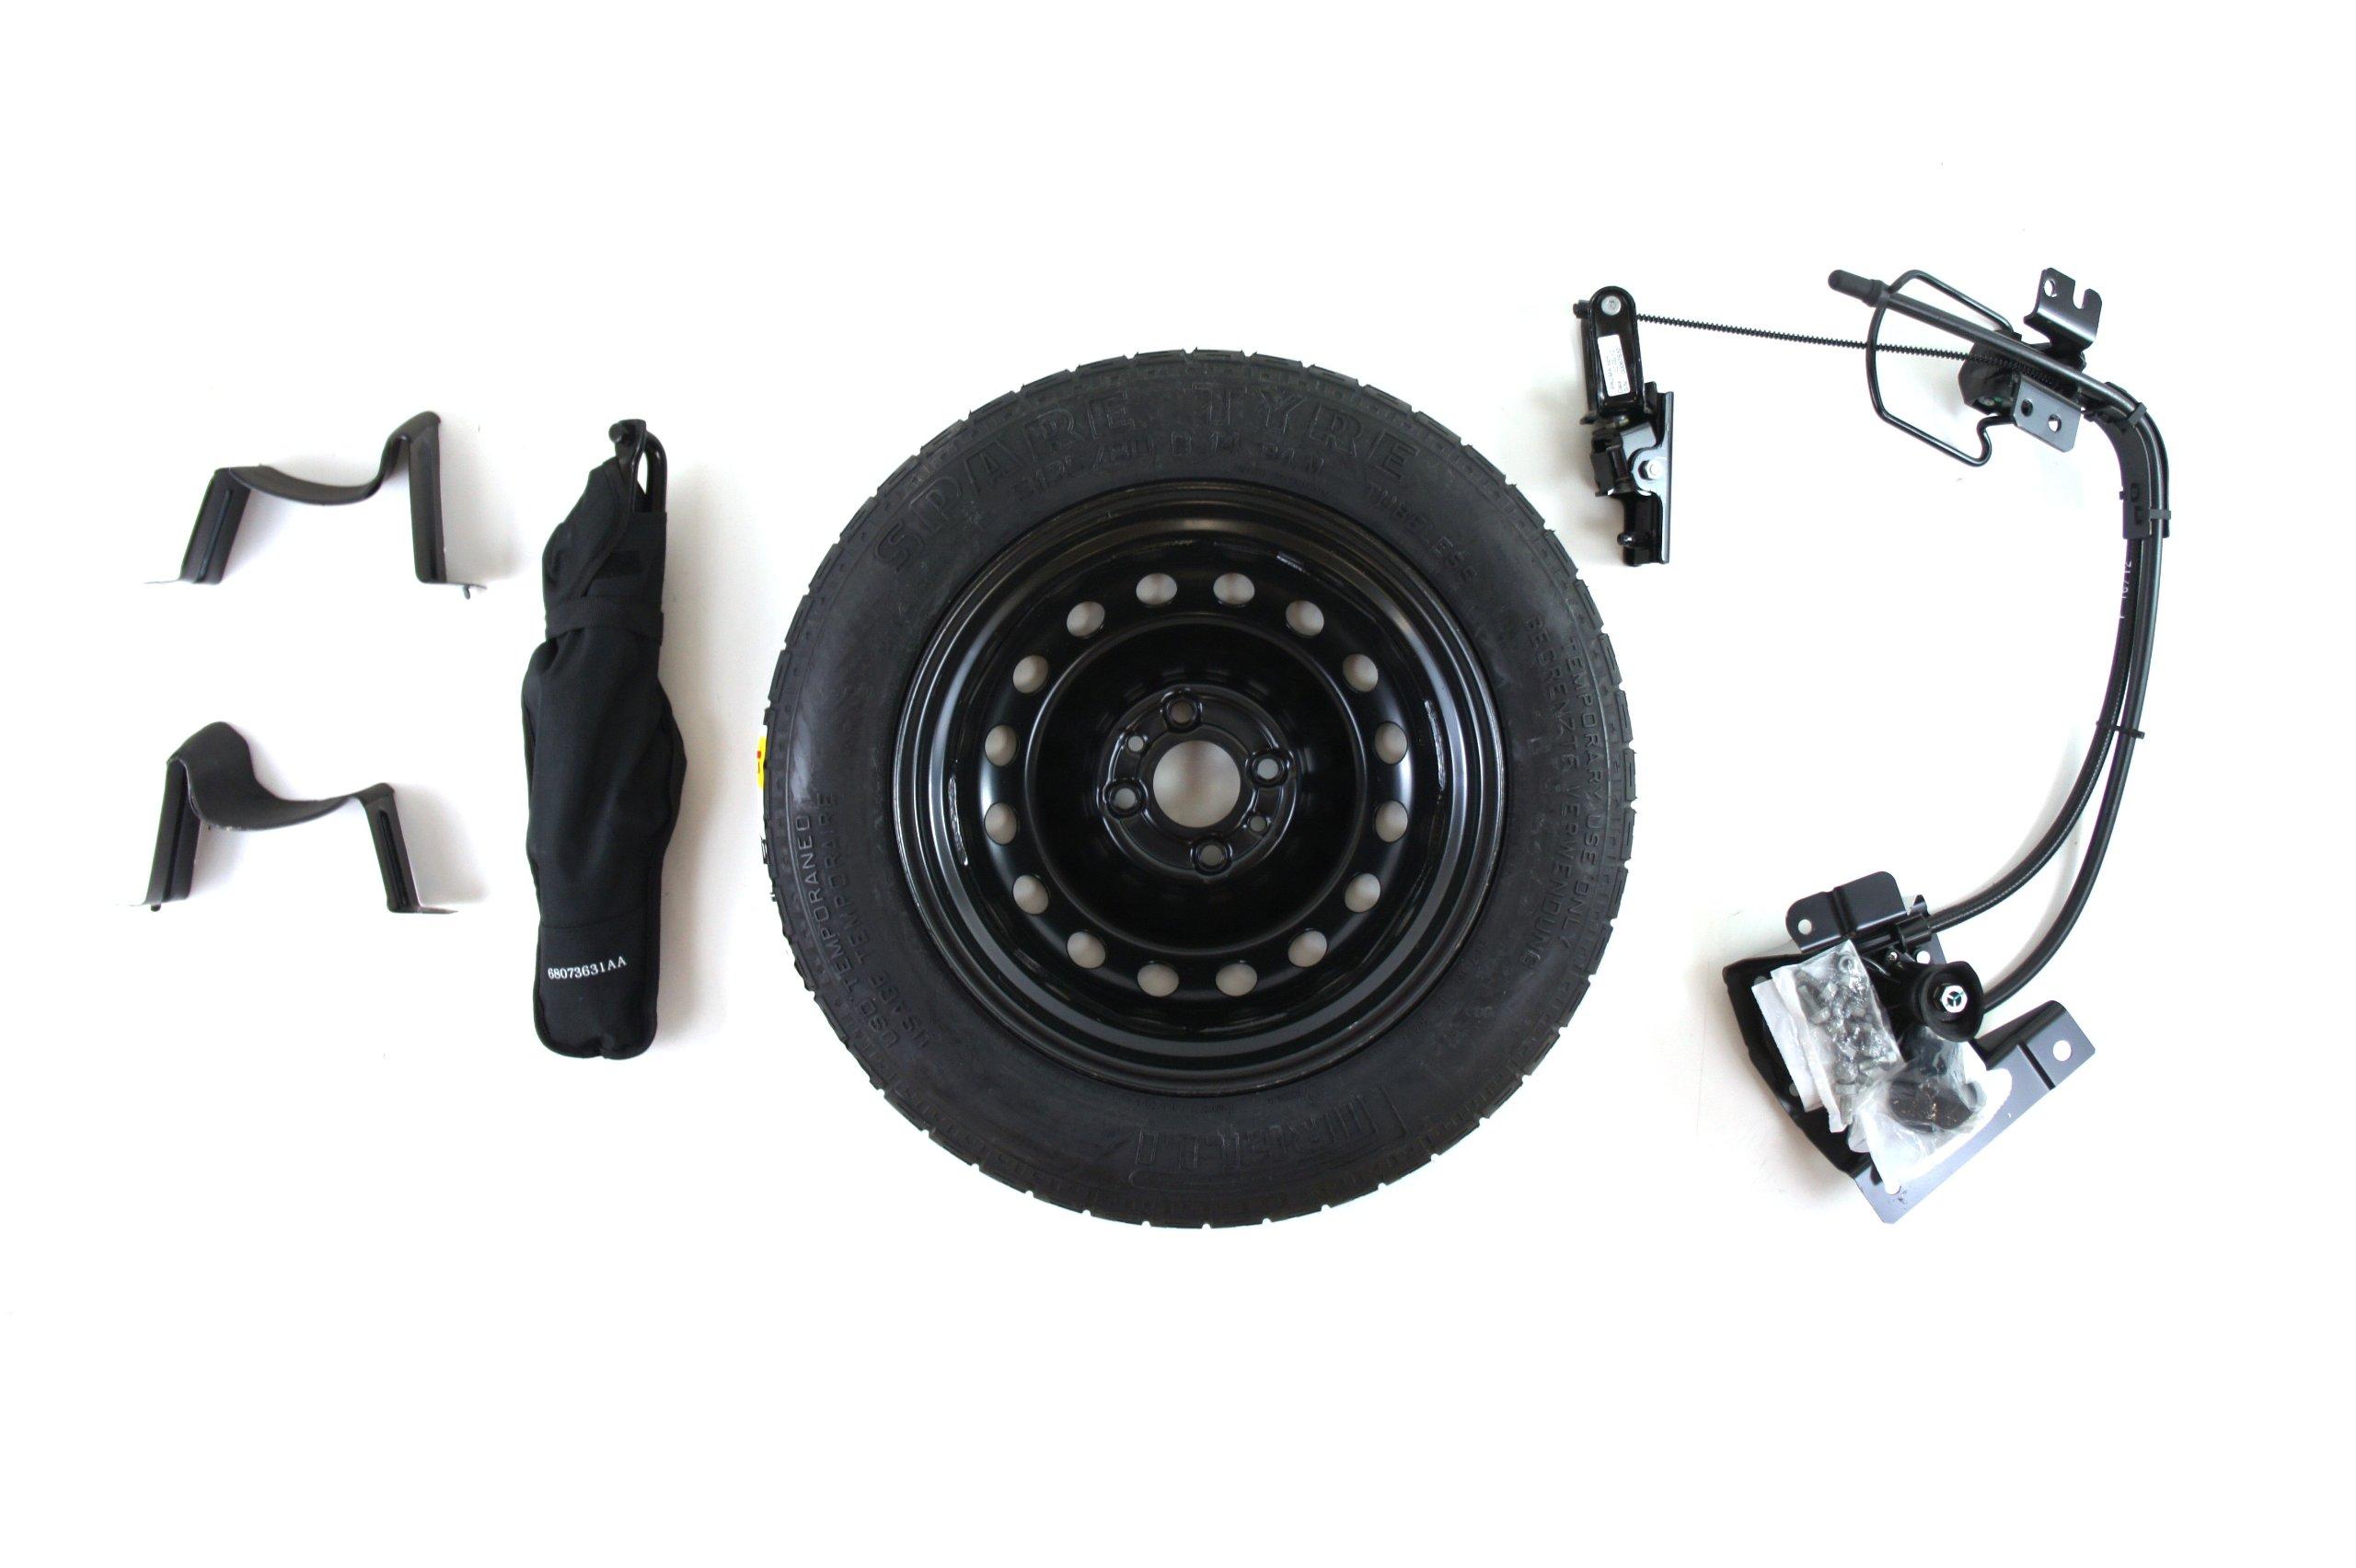 Genuine Fiat Accessories 82212995 Spare Tire Kit for Fiat 500/500C